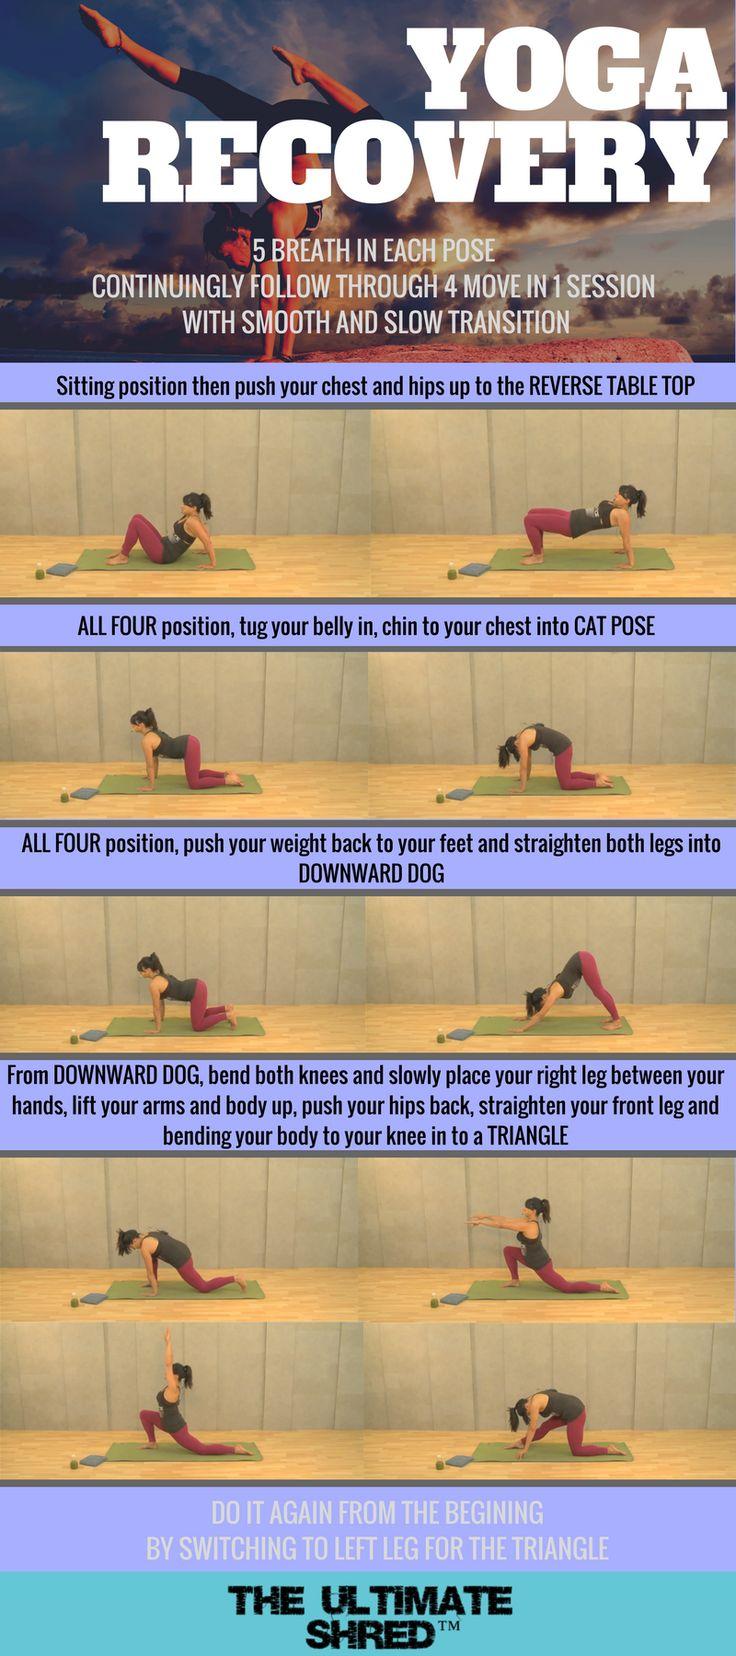 Get free workout plan here!